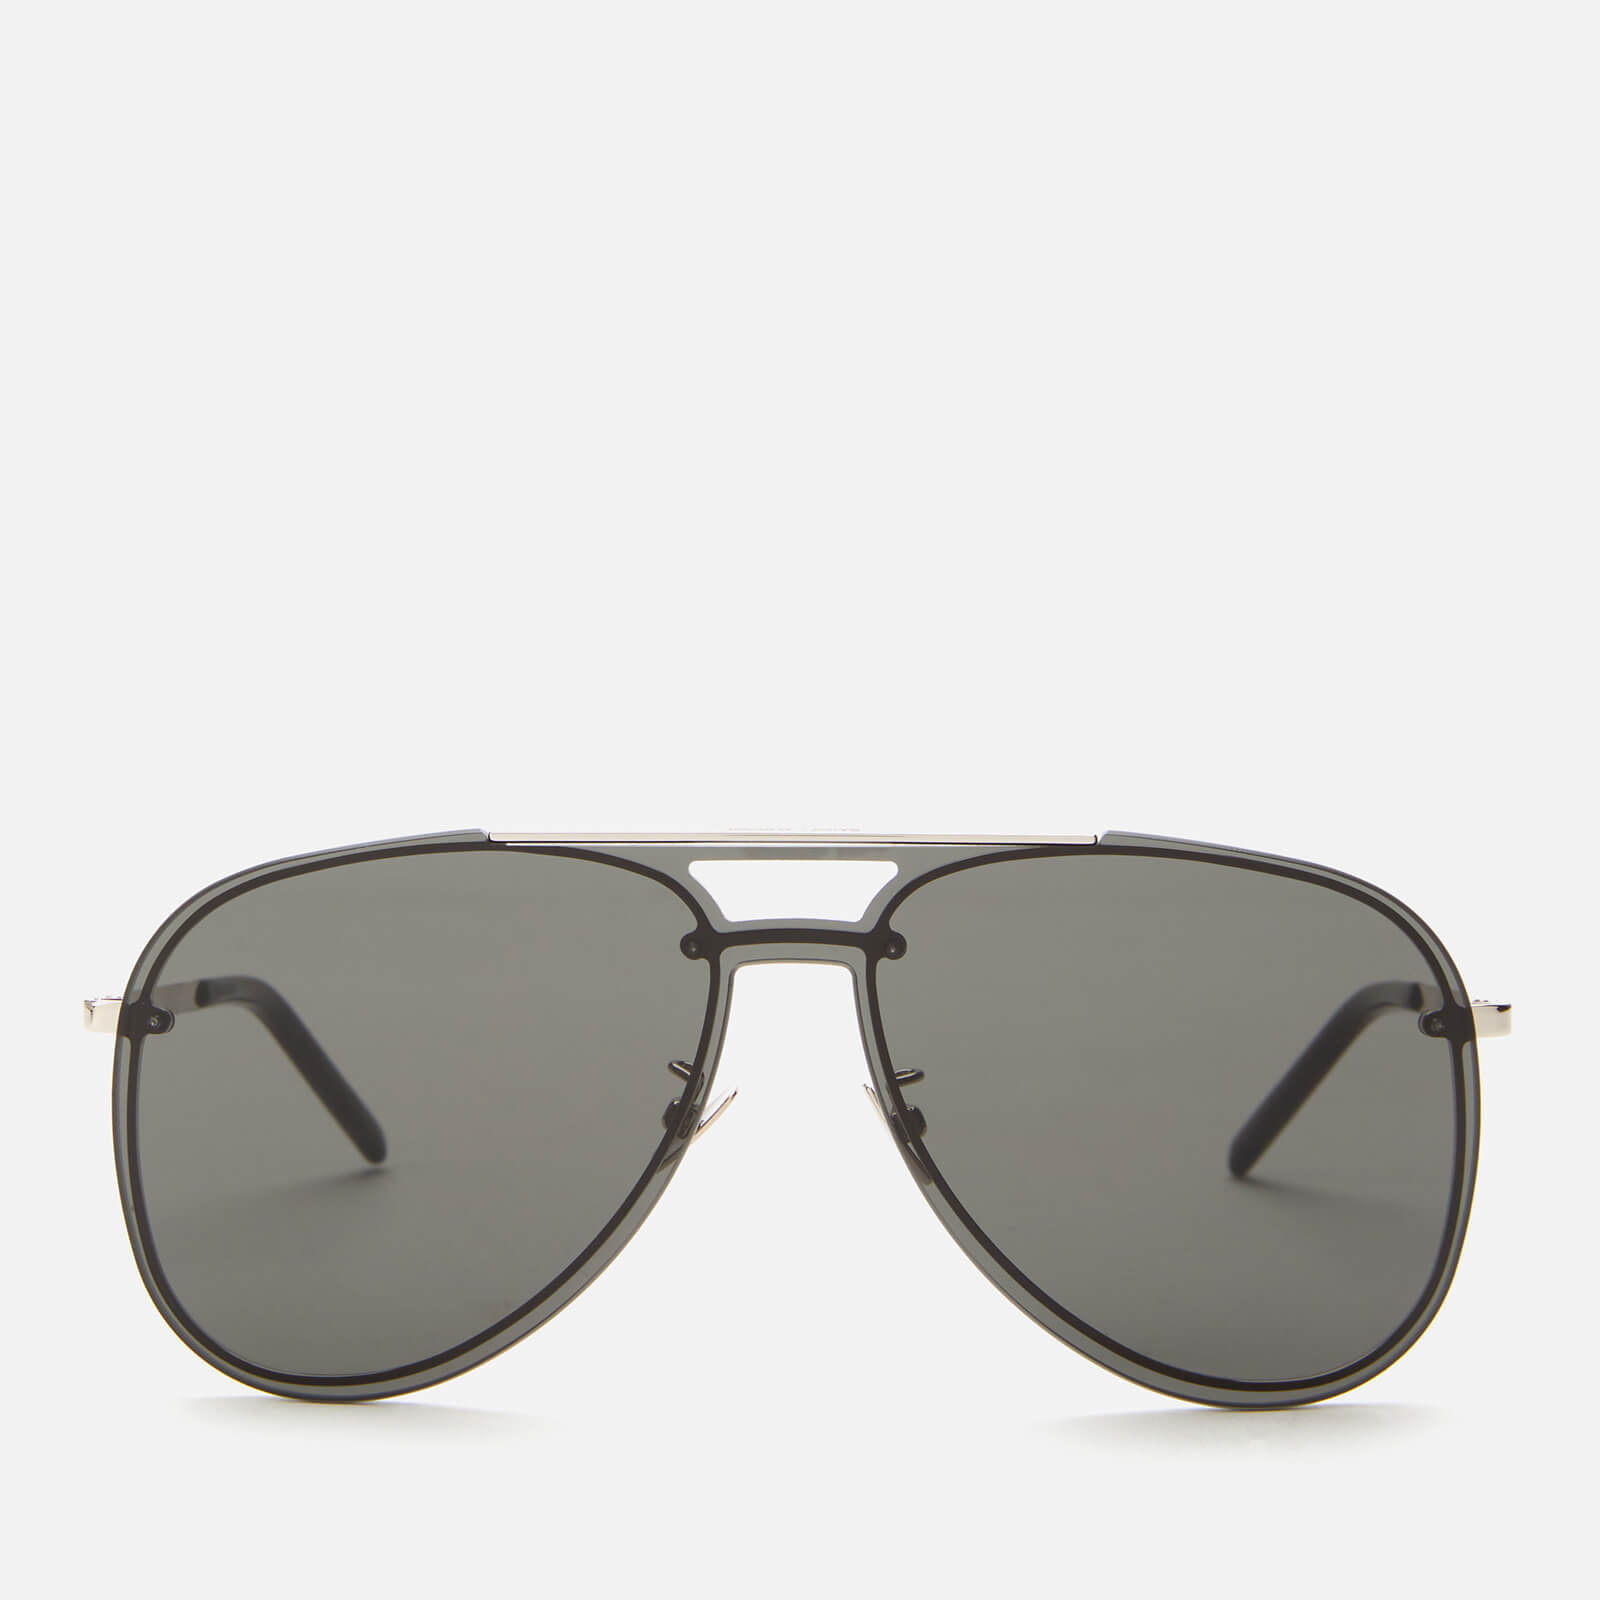 Saint Laurent Men's Classic 11 Mask Aviator Sunglasses - Silver/Grey